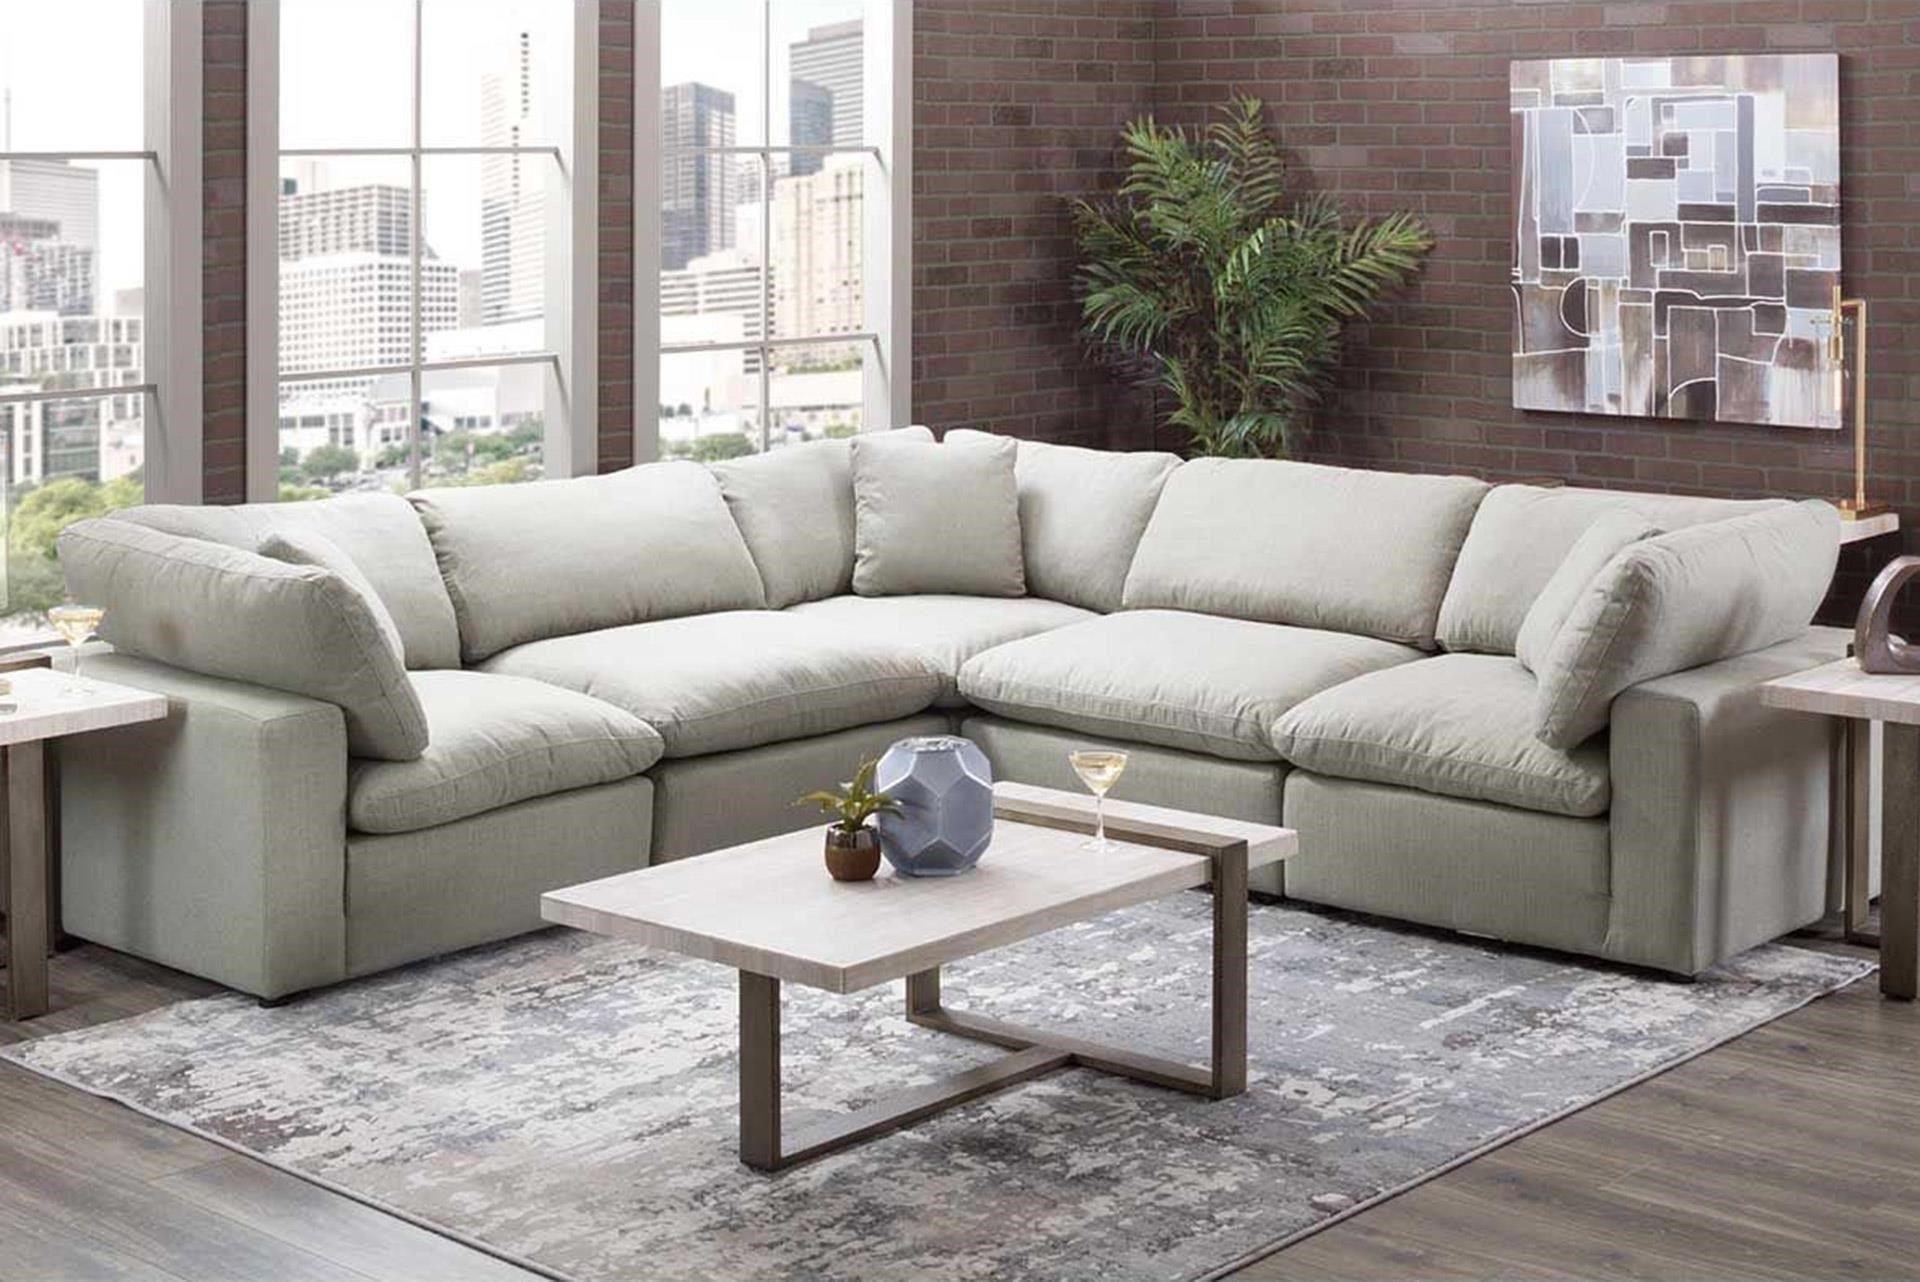 Grey Modular 5 Piece Sectional Fusion Furniture Furniture Condo Living Room